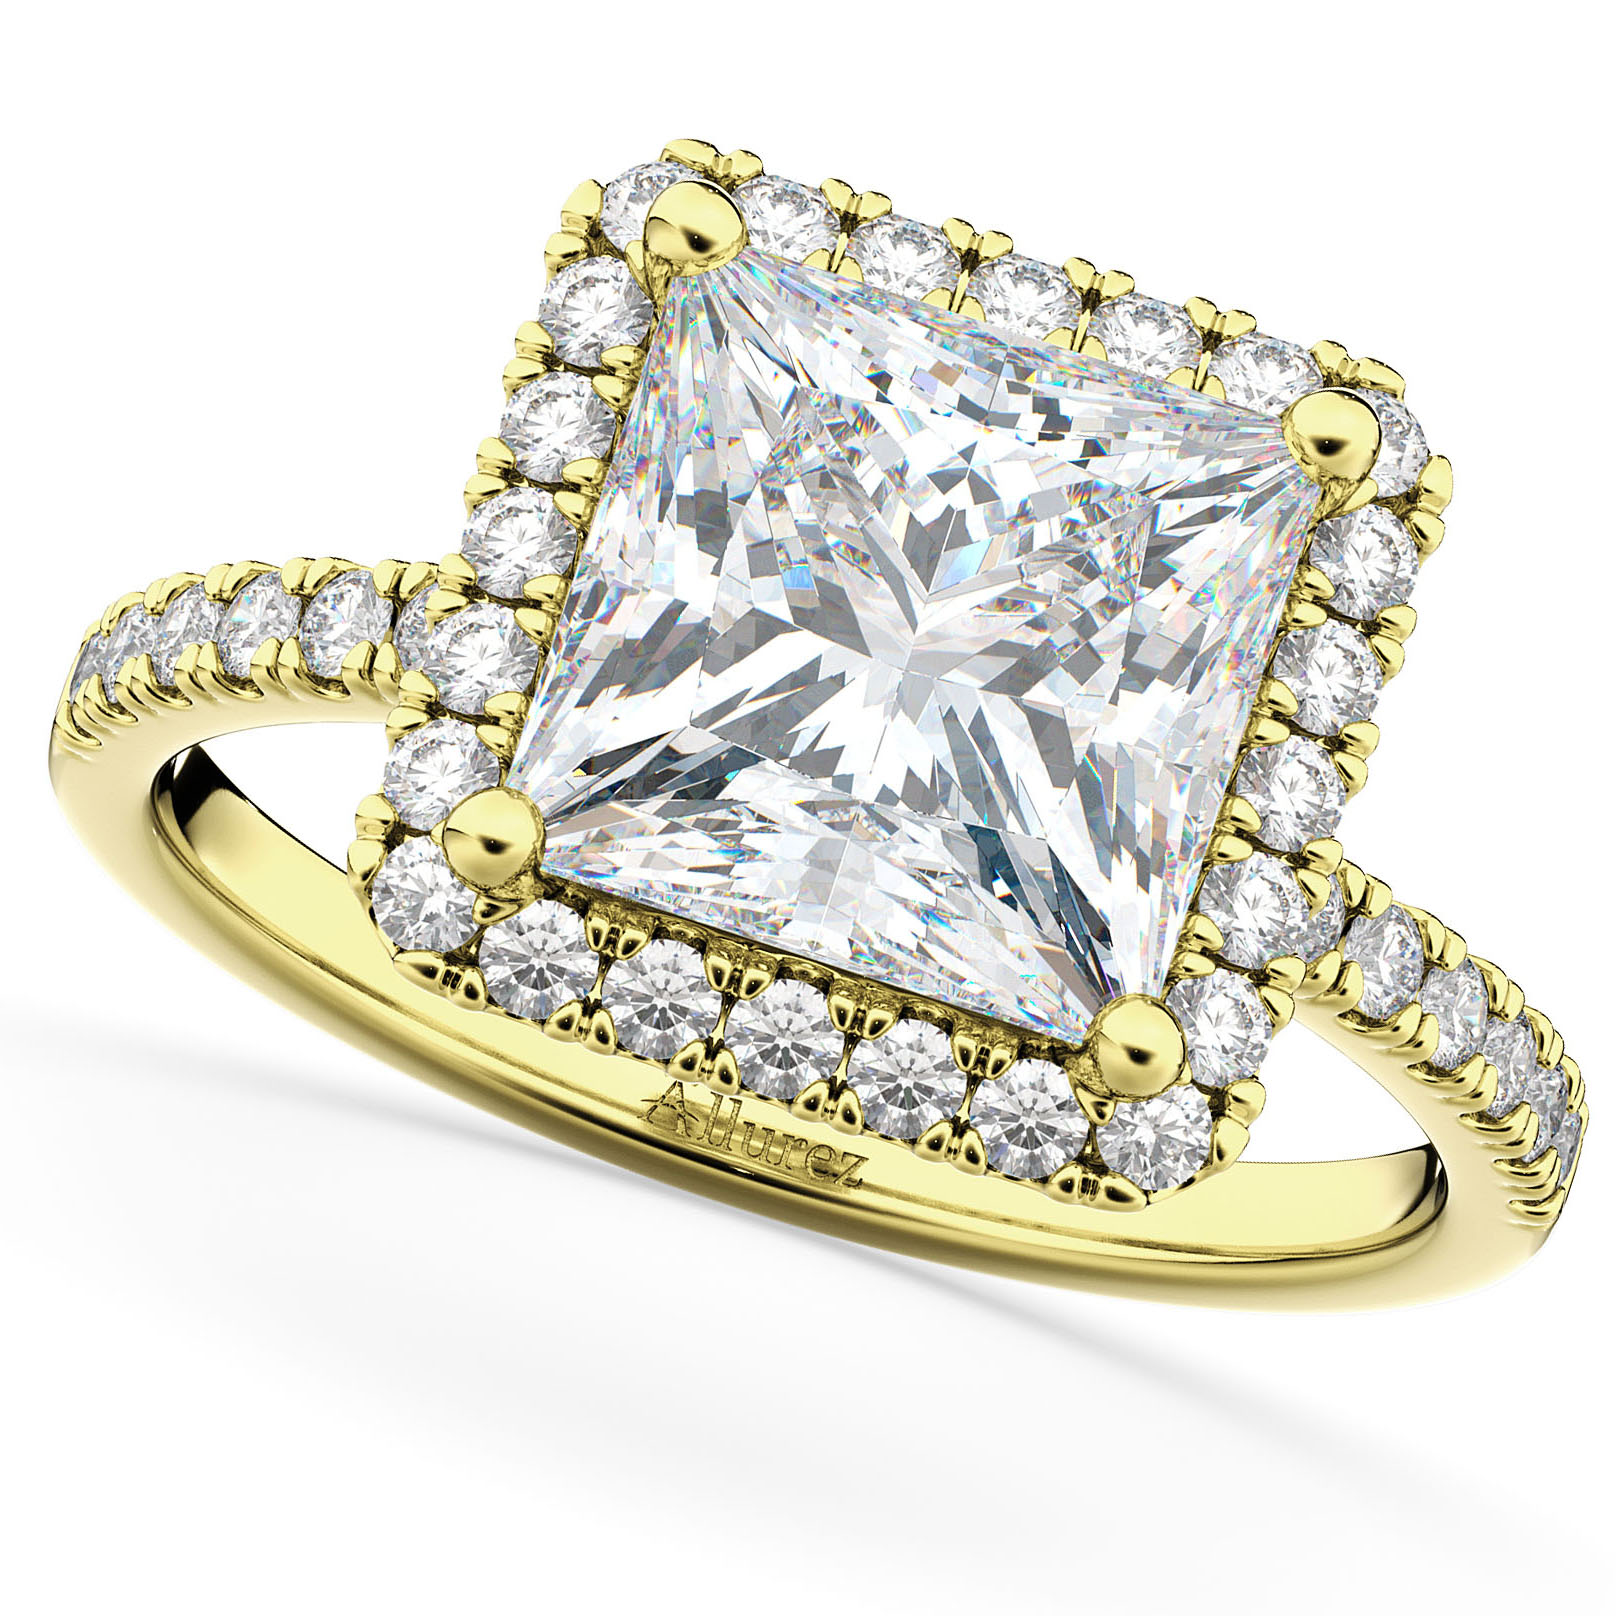 Princess Cut Halo Diamond Engagement Ring 14K Yellow Gold (3.58ct)